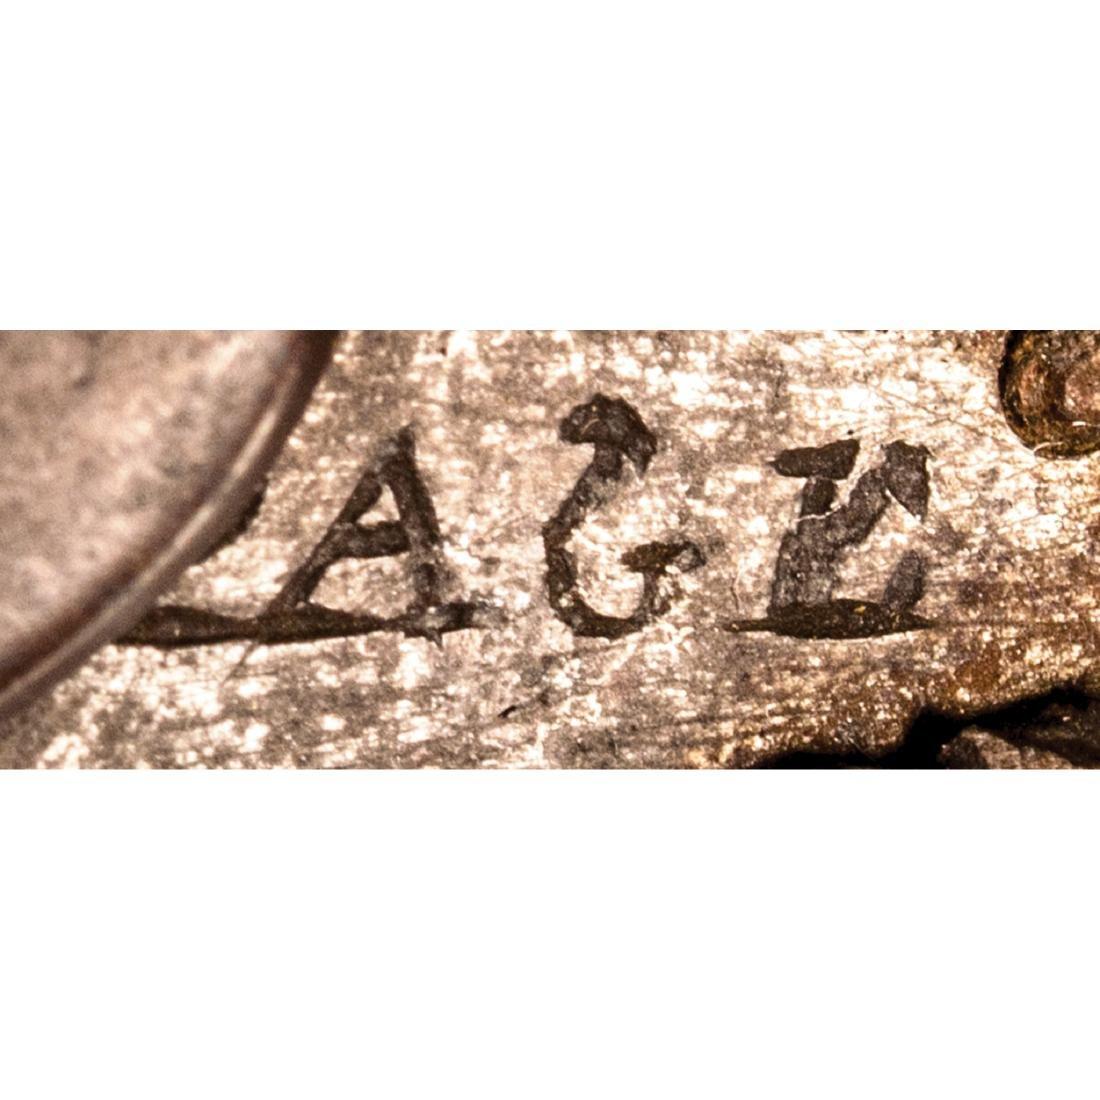 c 1760-80 LE PAGE French Pocket Flintlock Pistol - 3